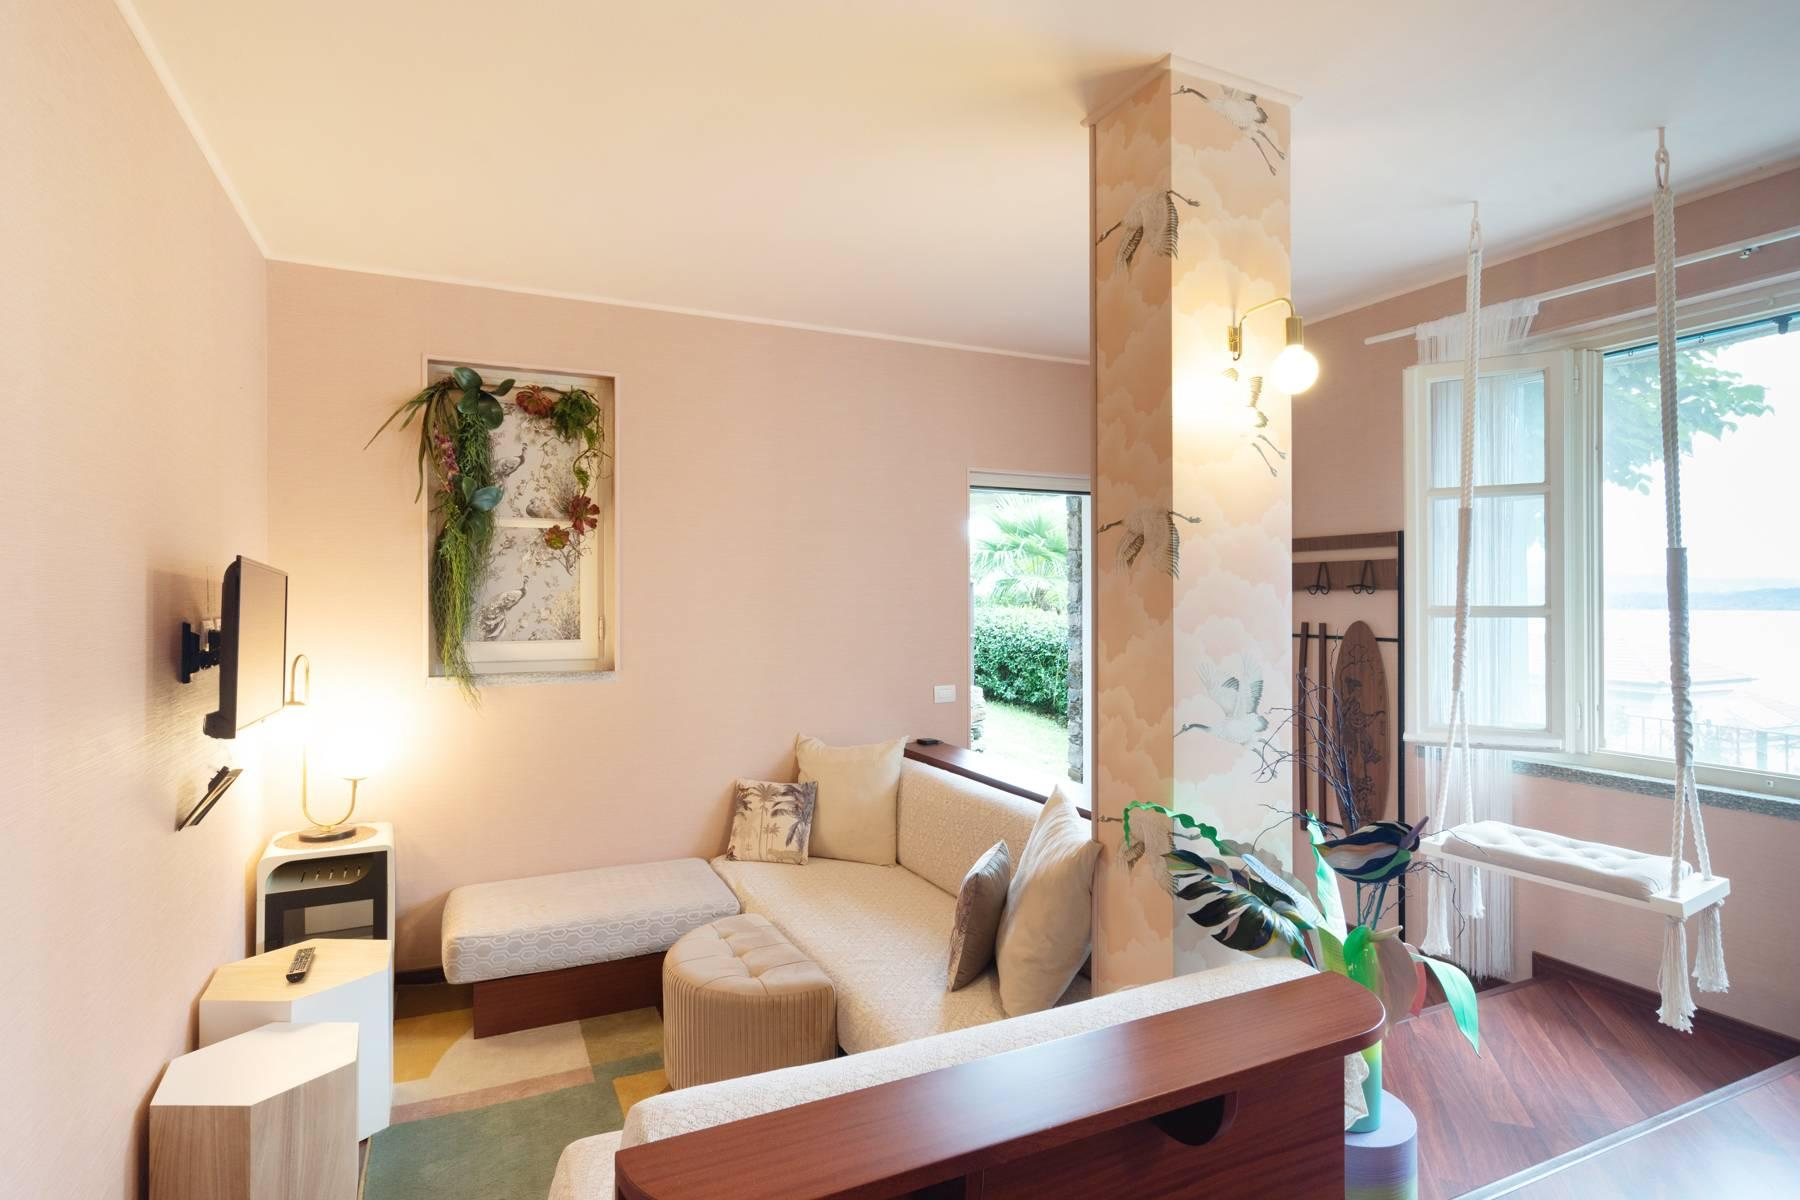 Elegant apartment in the small hamlet of Belgirate - 6